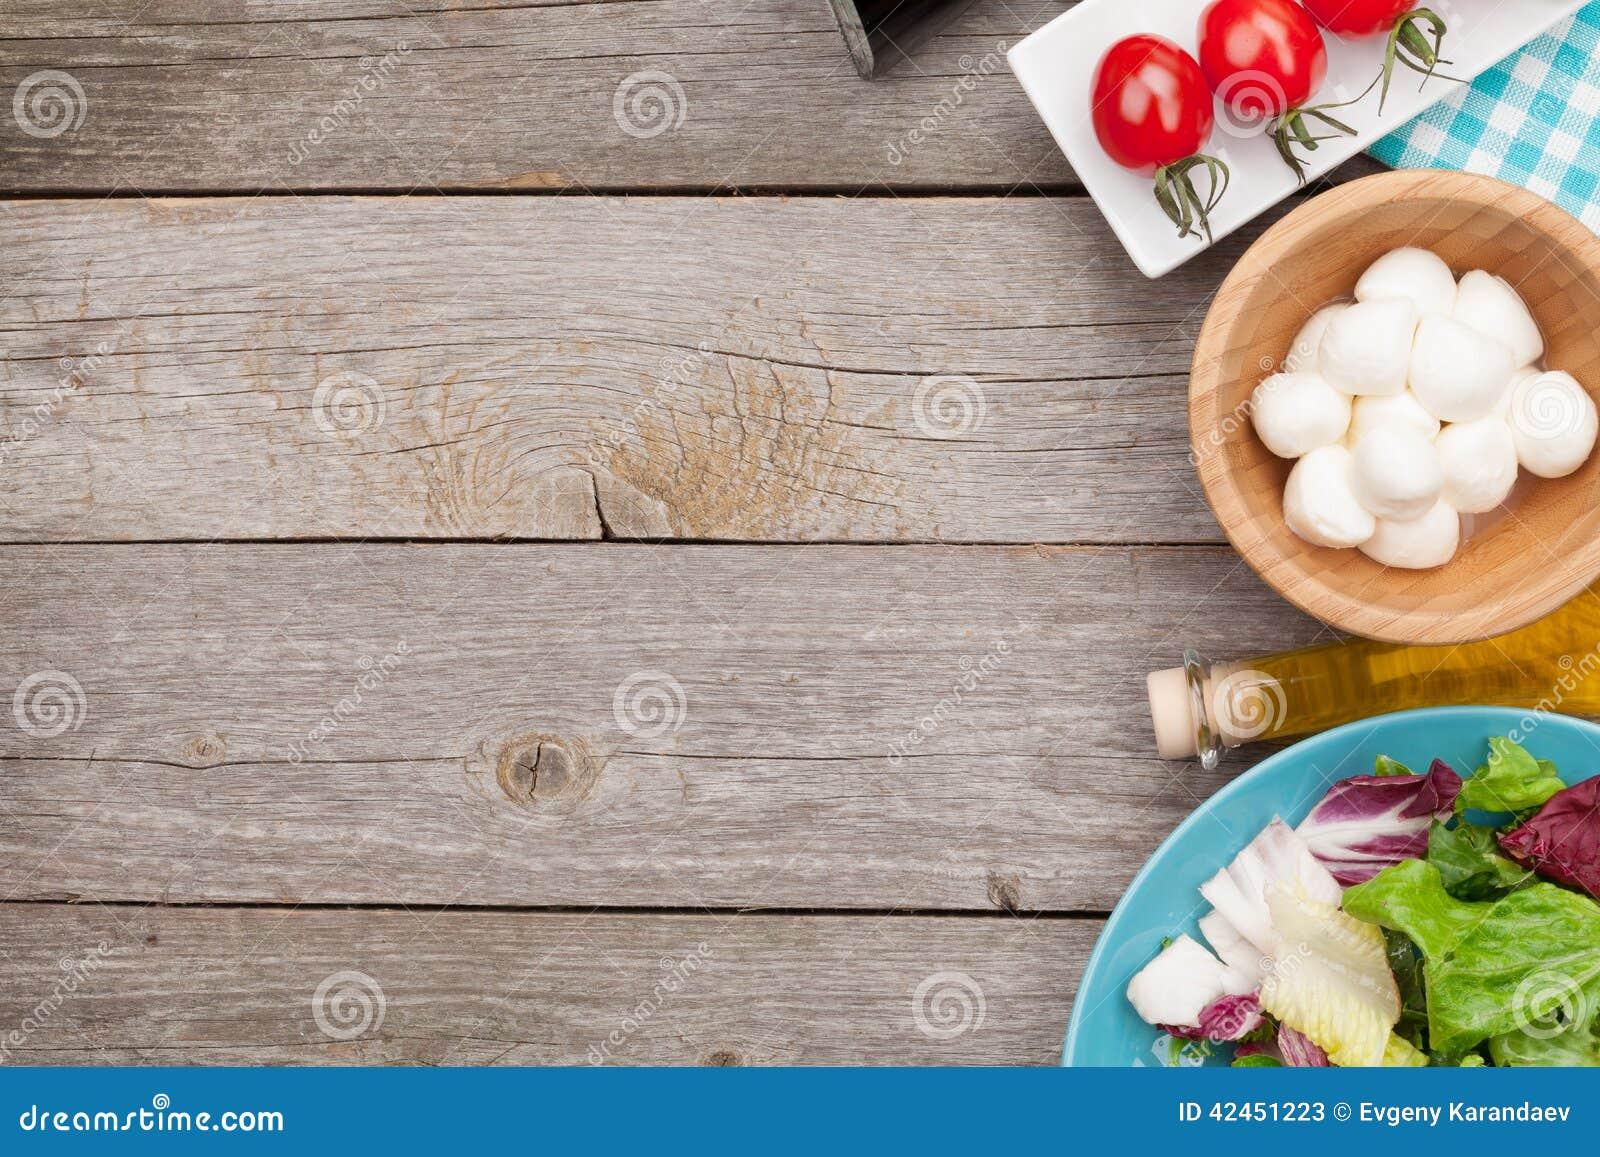 Frischer gesunder Salat, Tomaten, Mozzarella